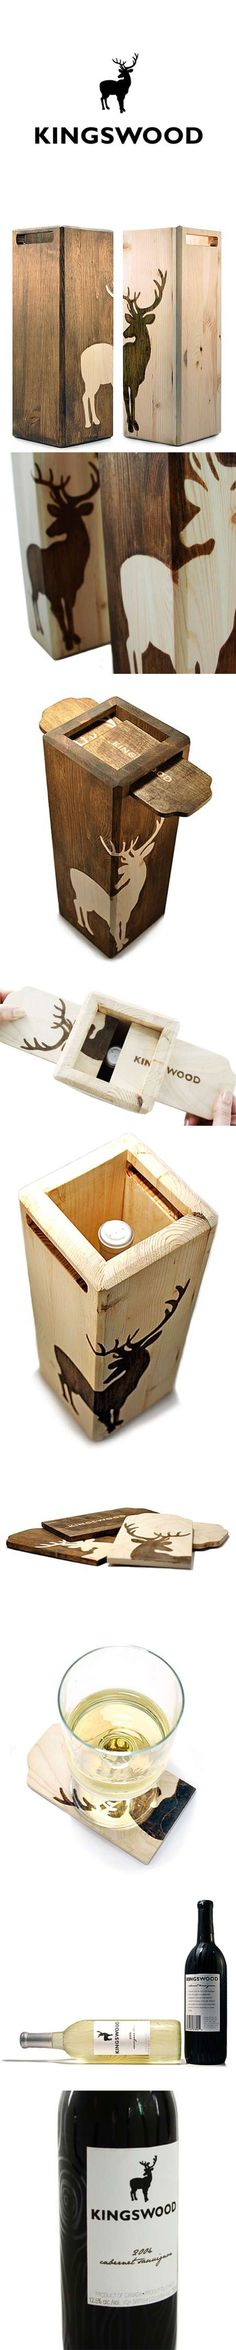 Kingswood Packaging Design. Repinned by www.strobl-kriegner.com #branding #packaging #design #creative #marketing